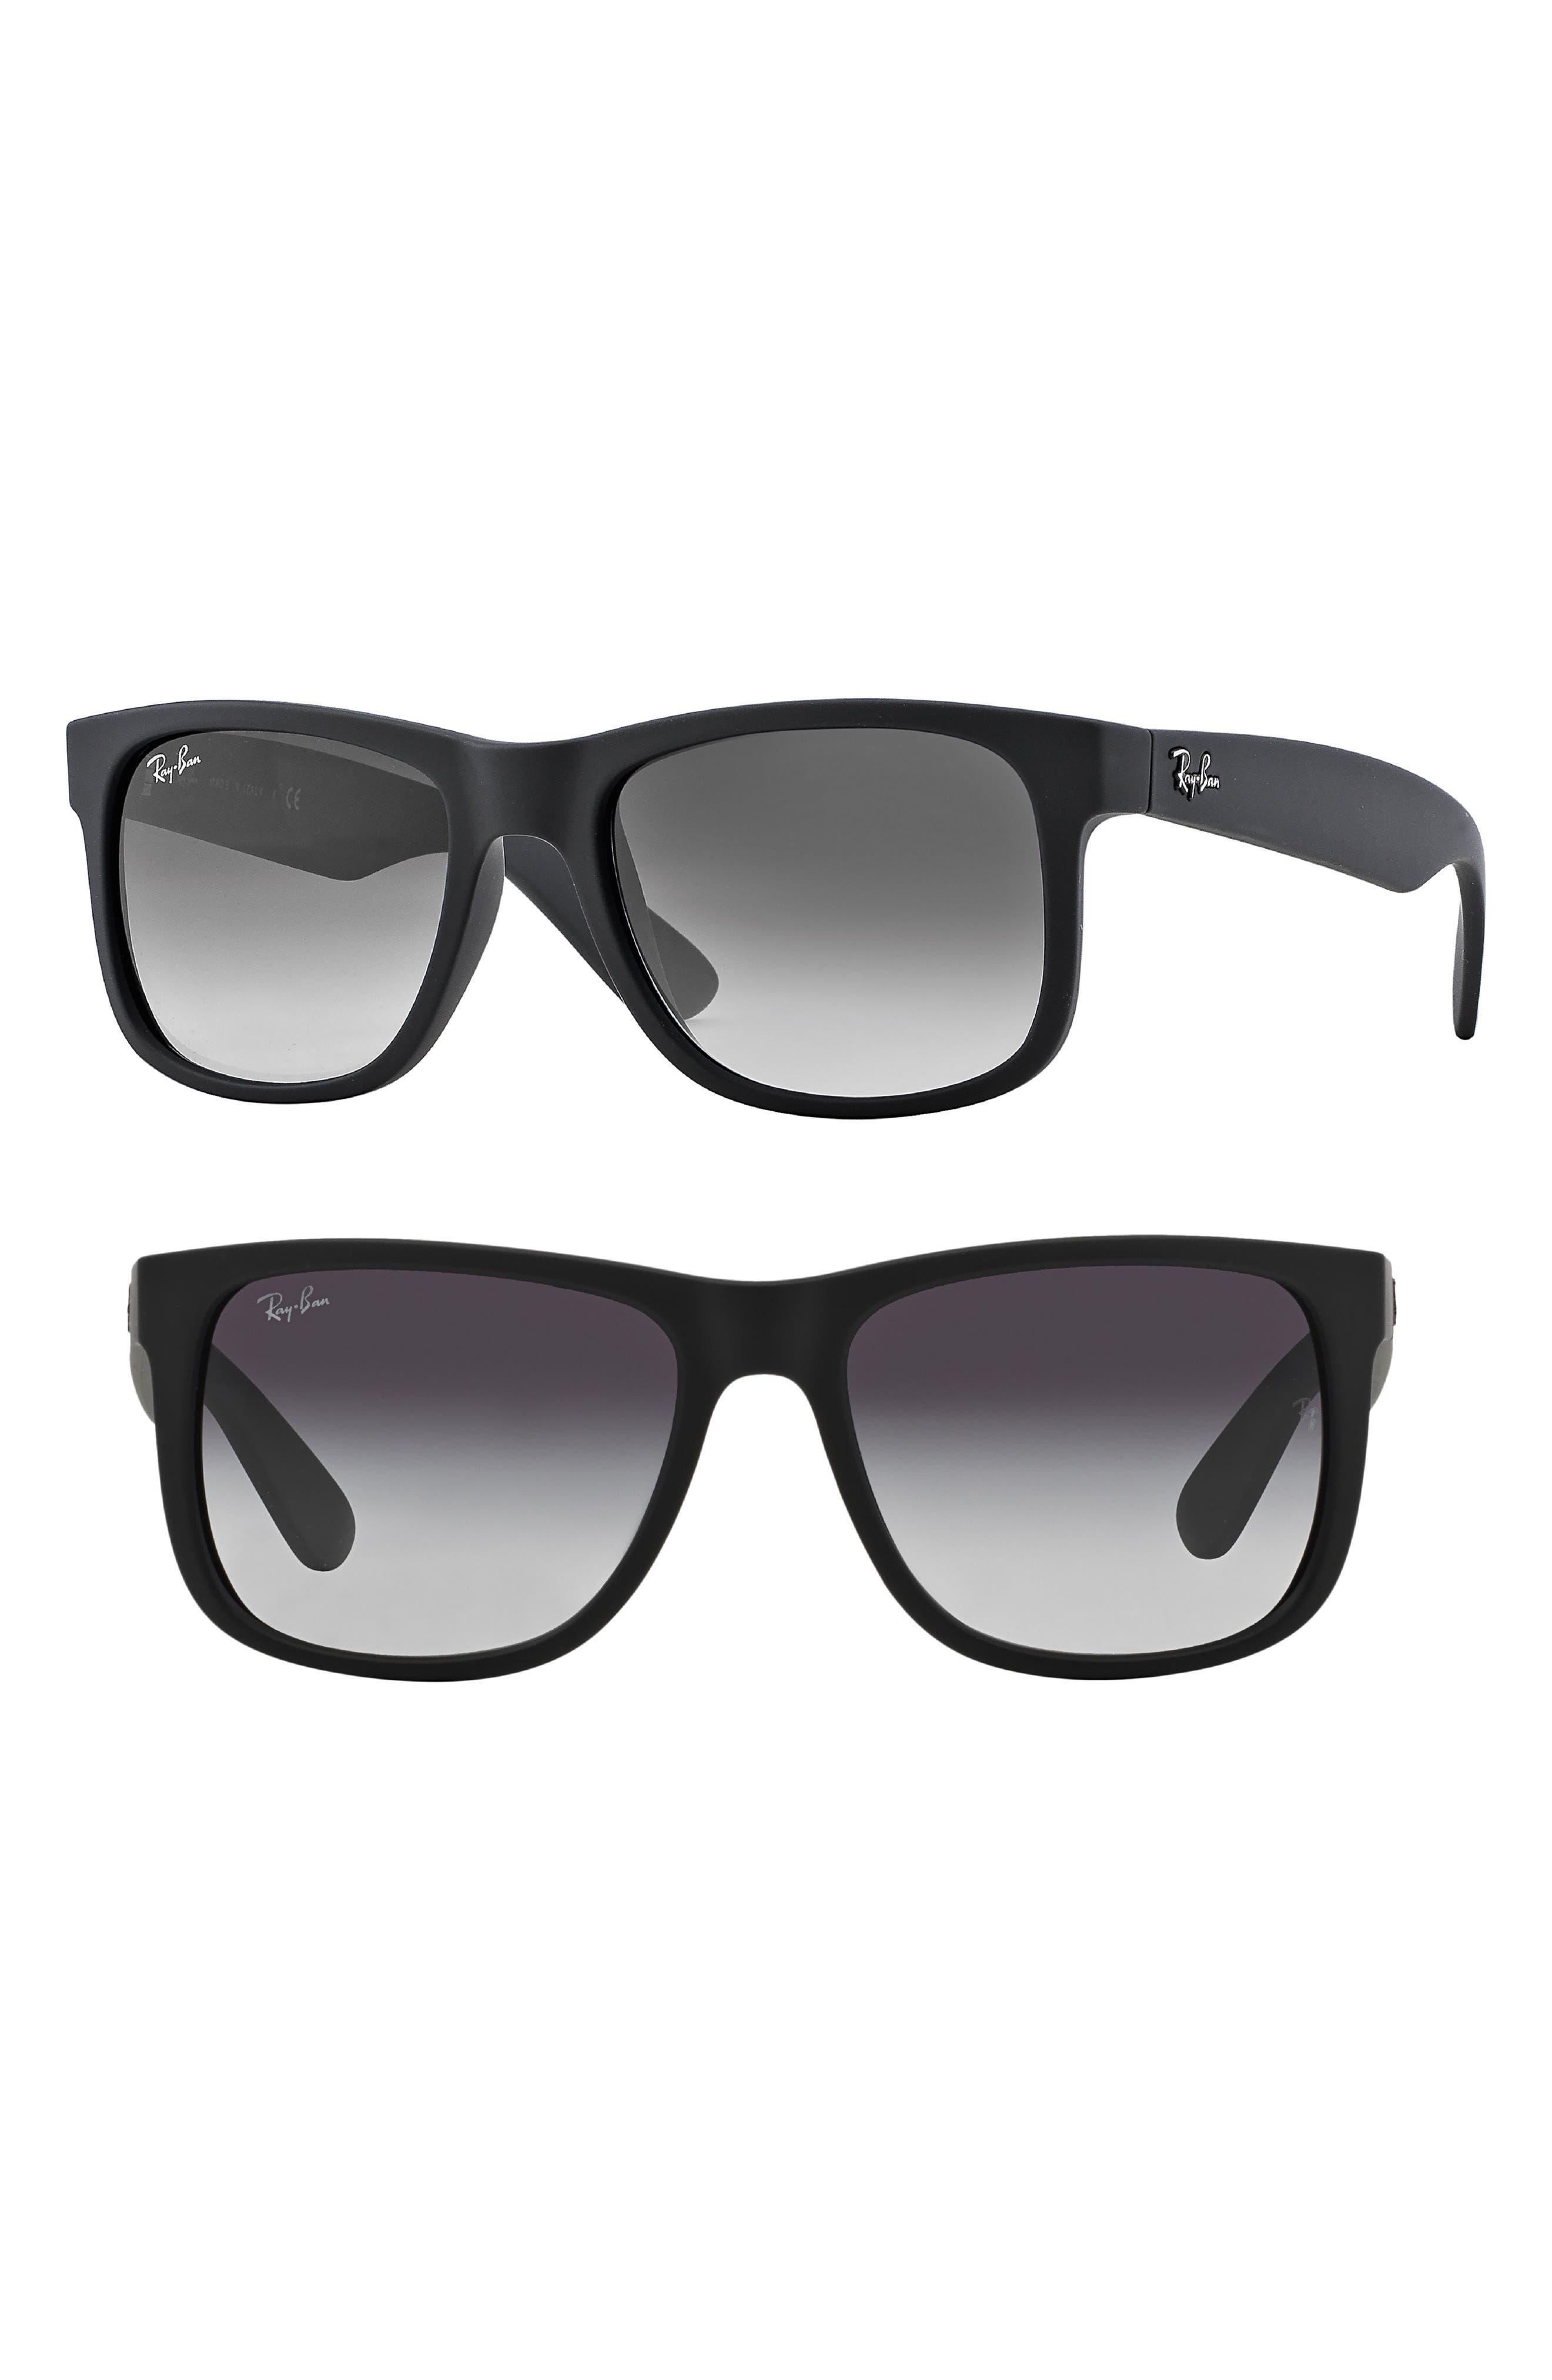 RAY-BAN, Youngster 54mm Sunglasses, Main thumbnail 1, color, BLACK